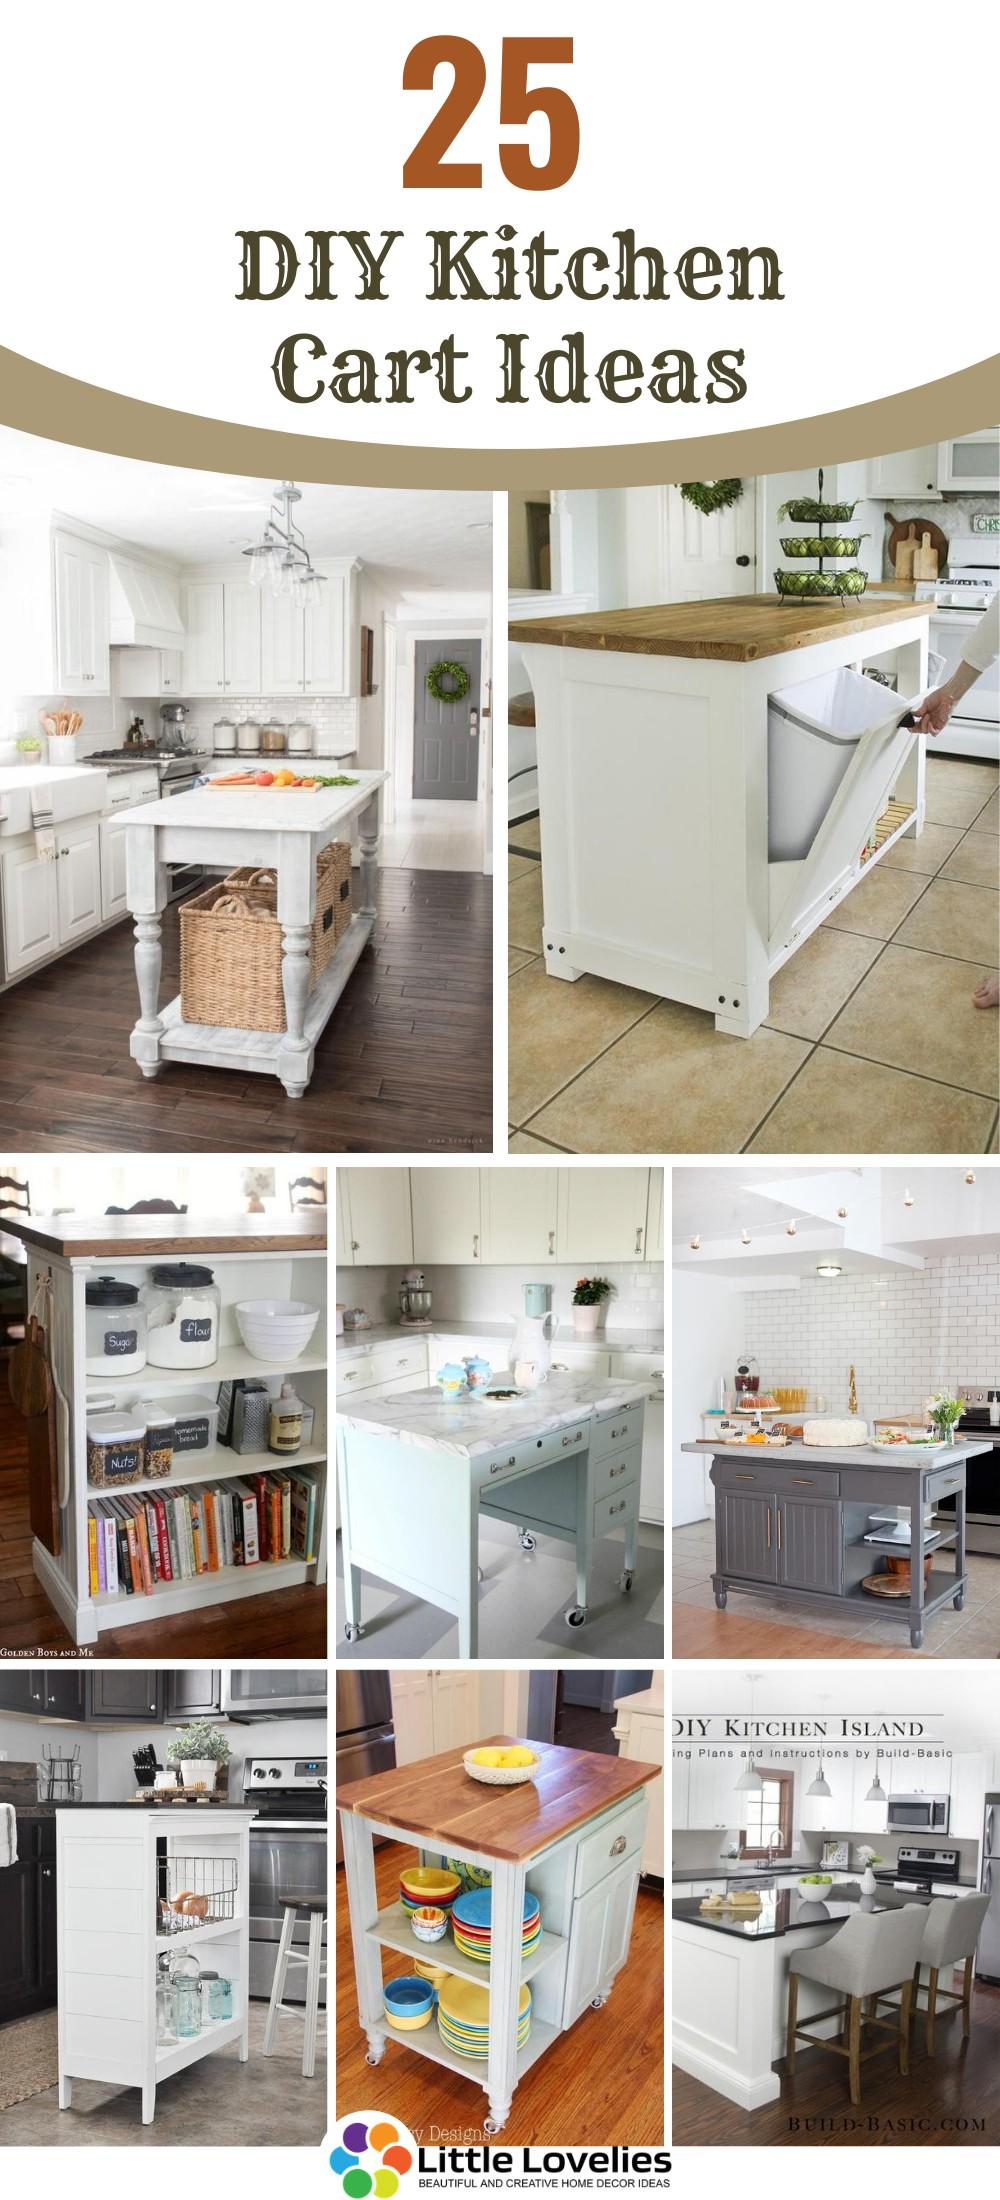 25 DIY Kitchen Cart Ideas